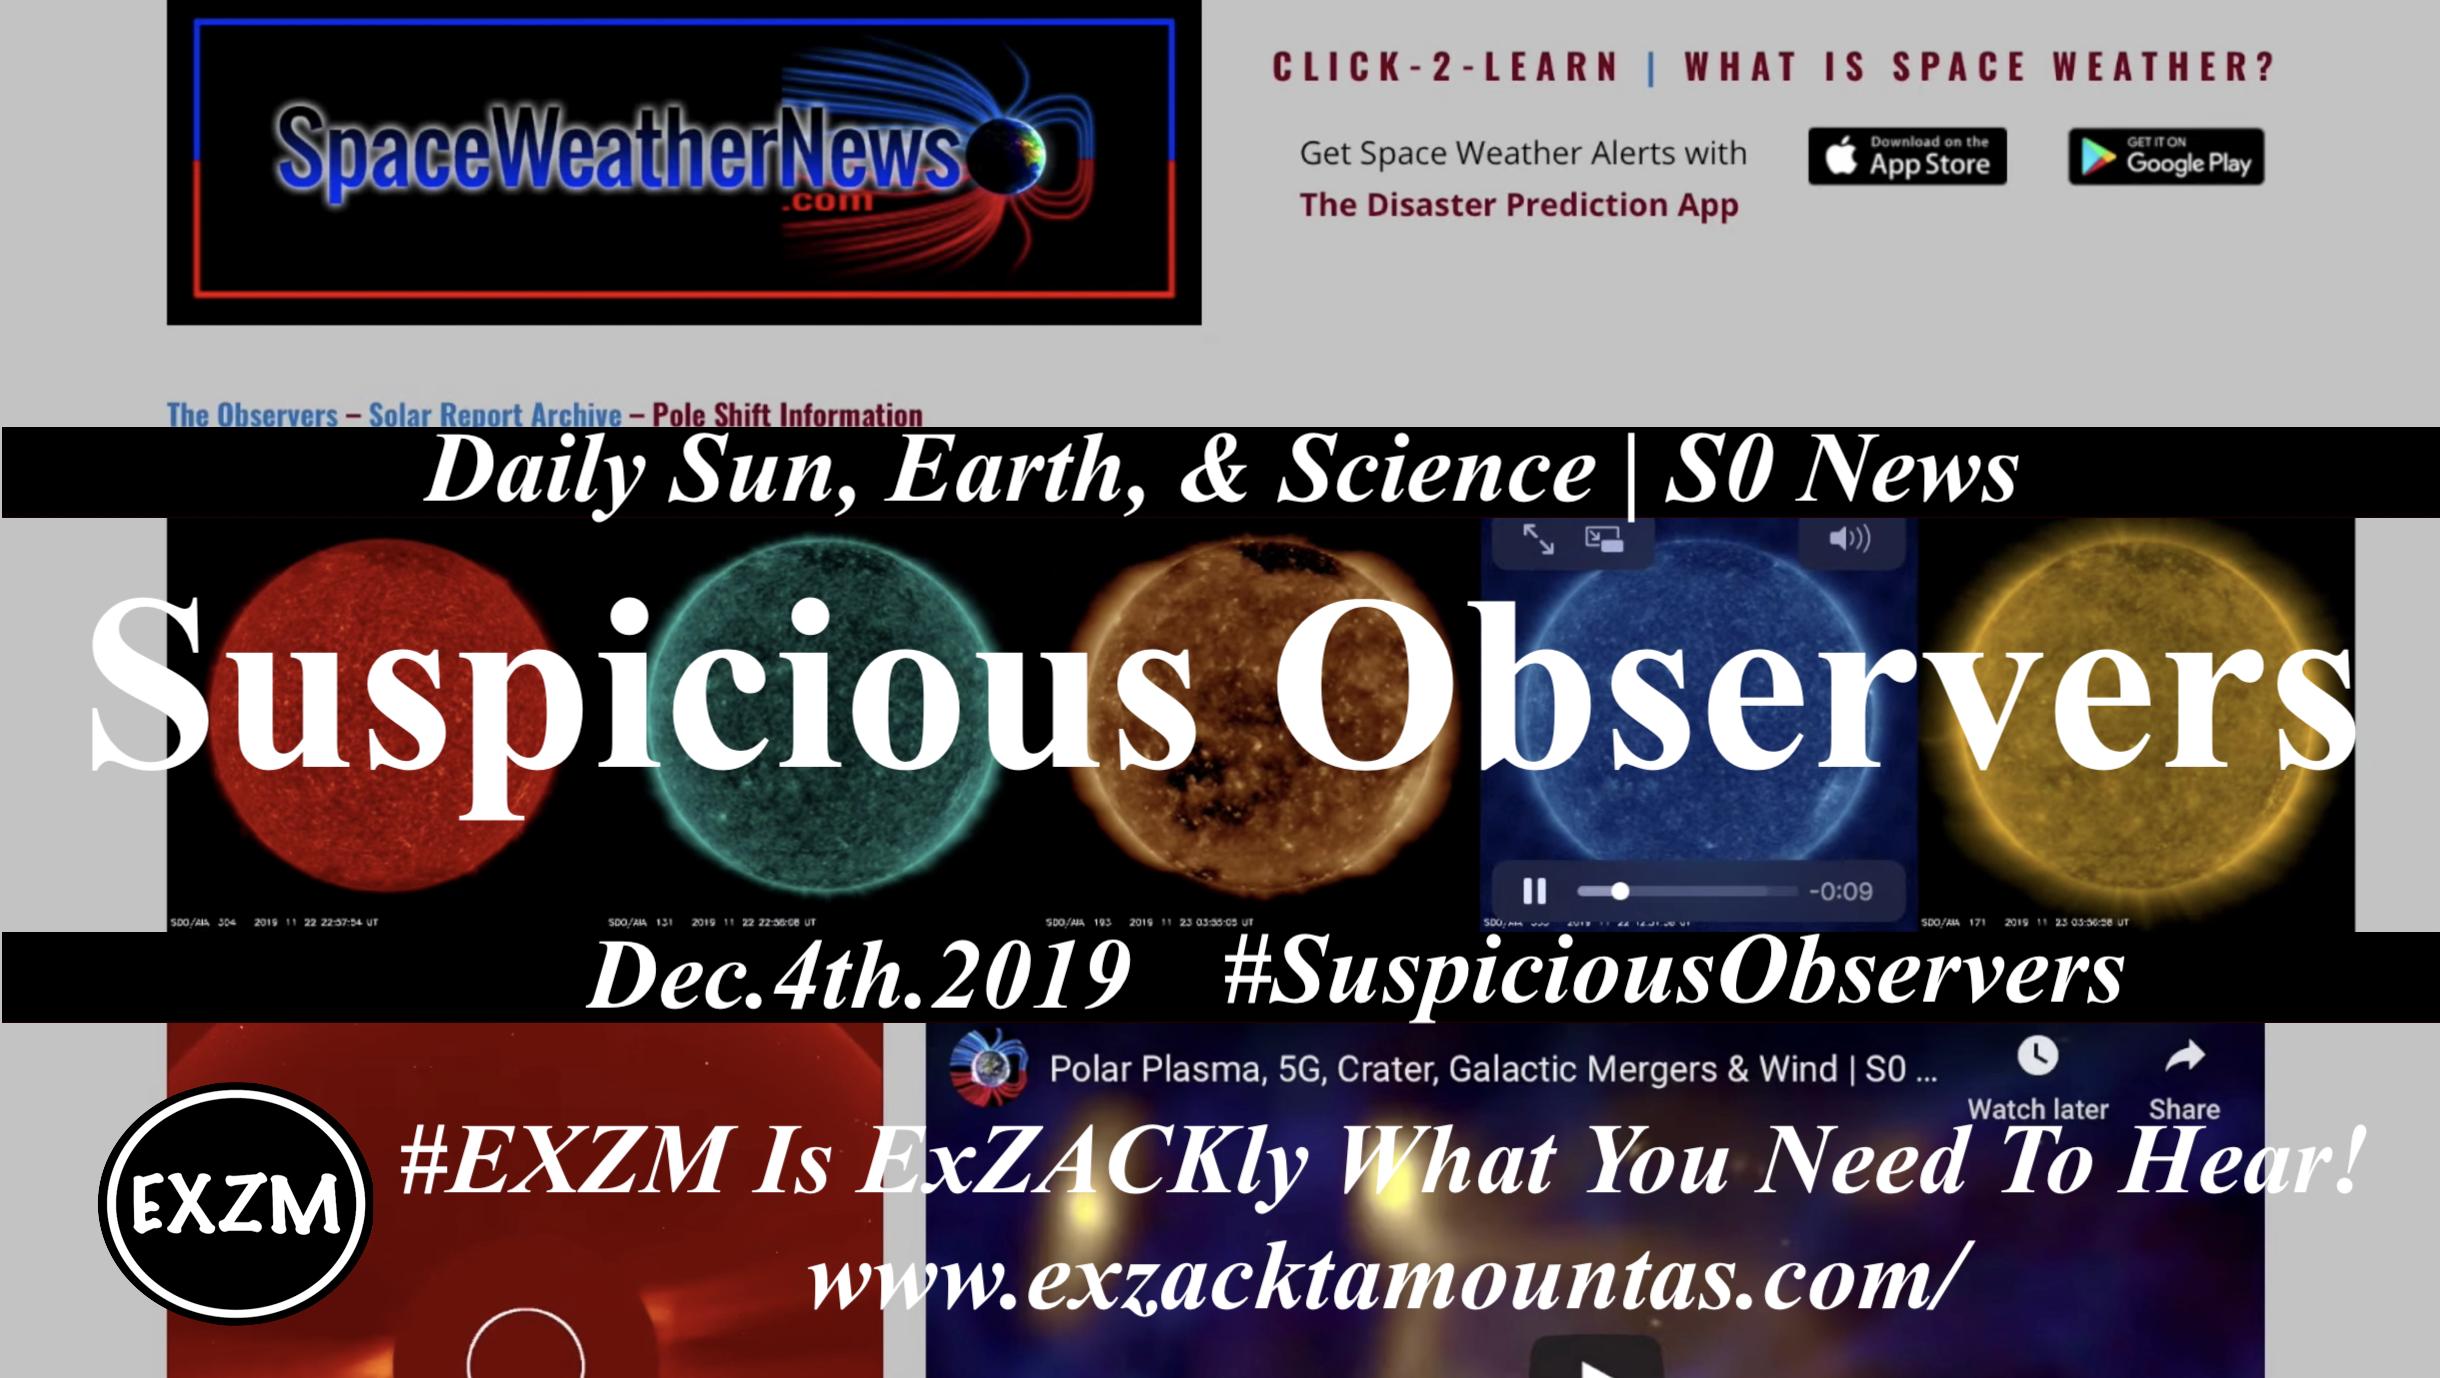 EXZM Suspicious Observers post 12 4 2019